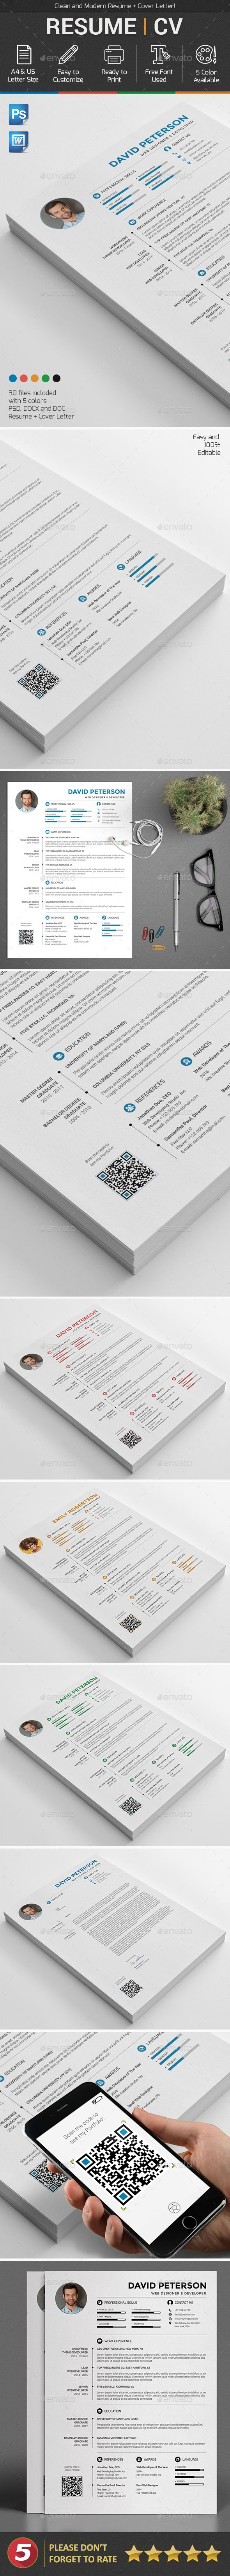 58 Best Resume Images On Pinterest Resume Cv Cv Design And